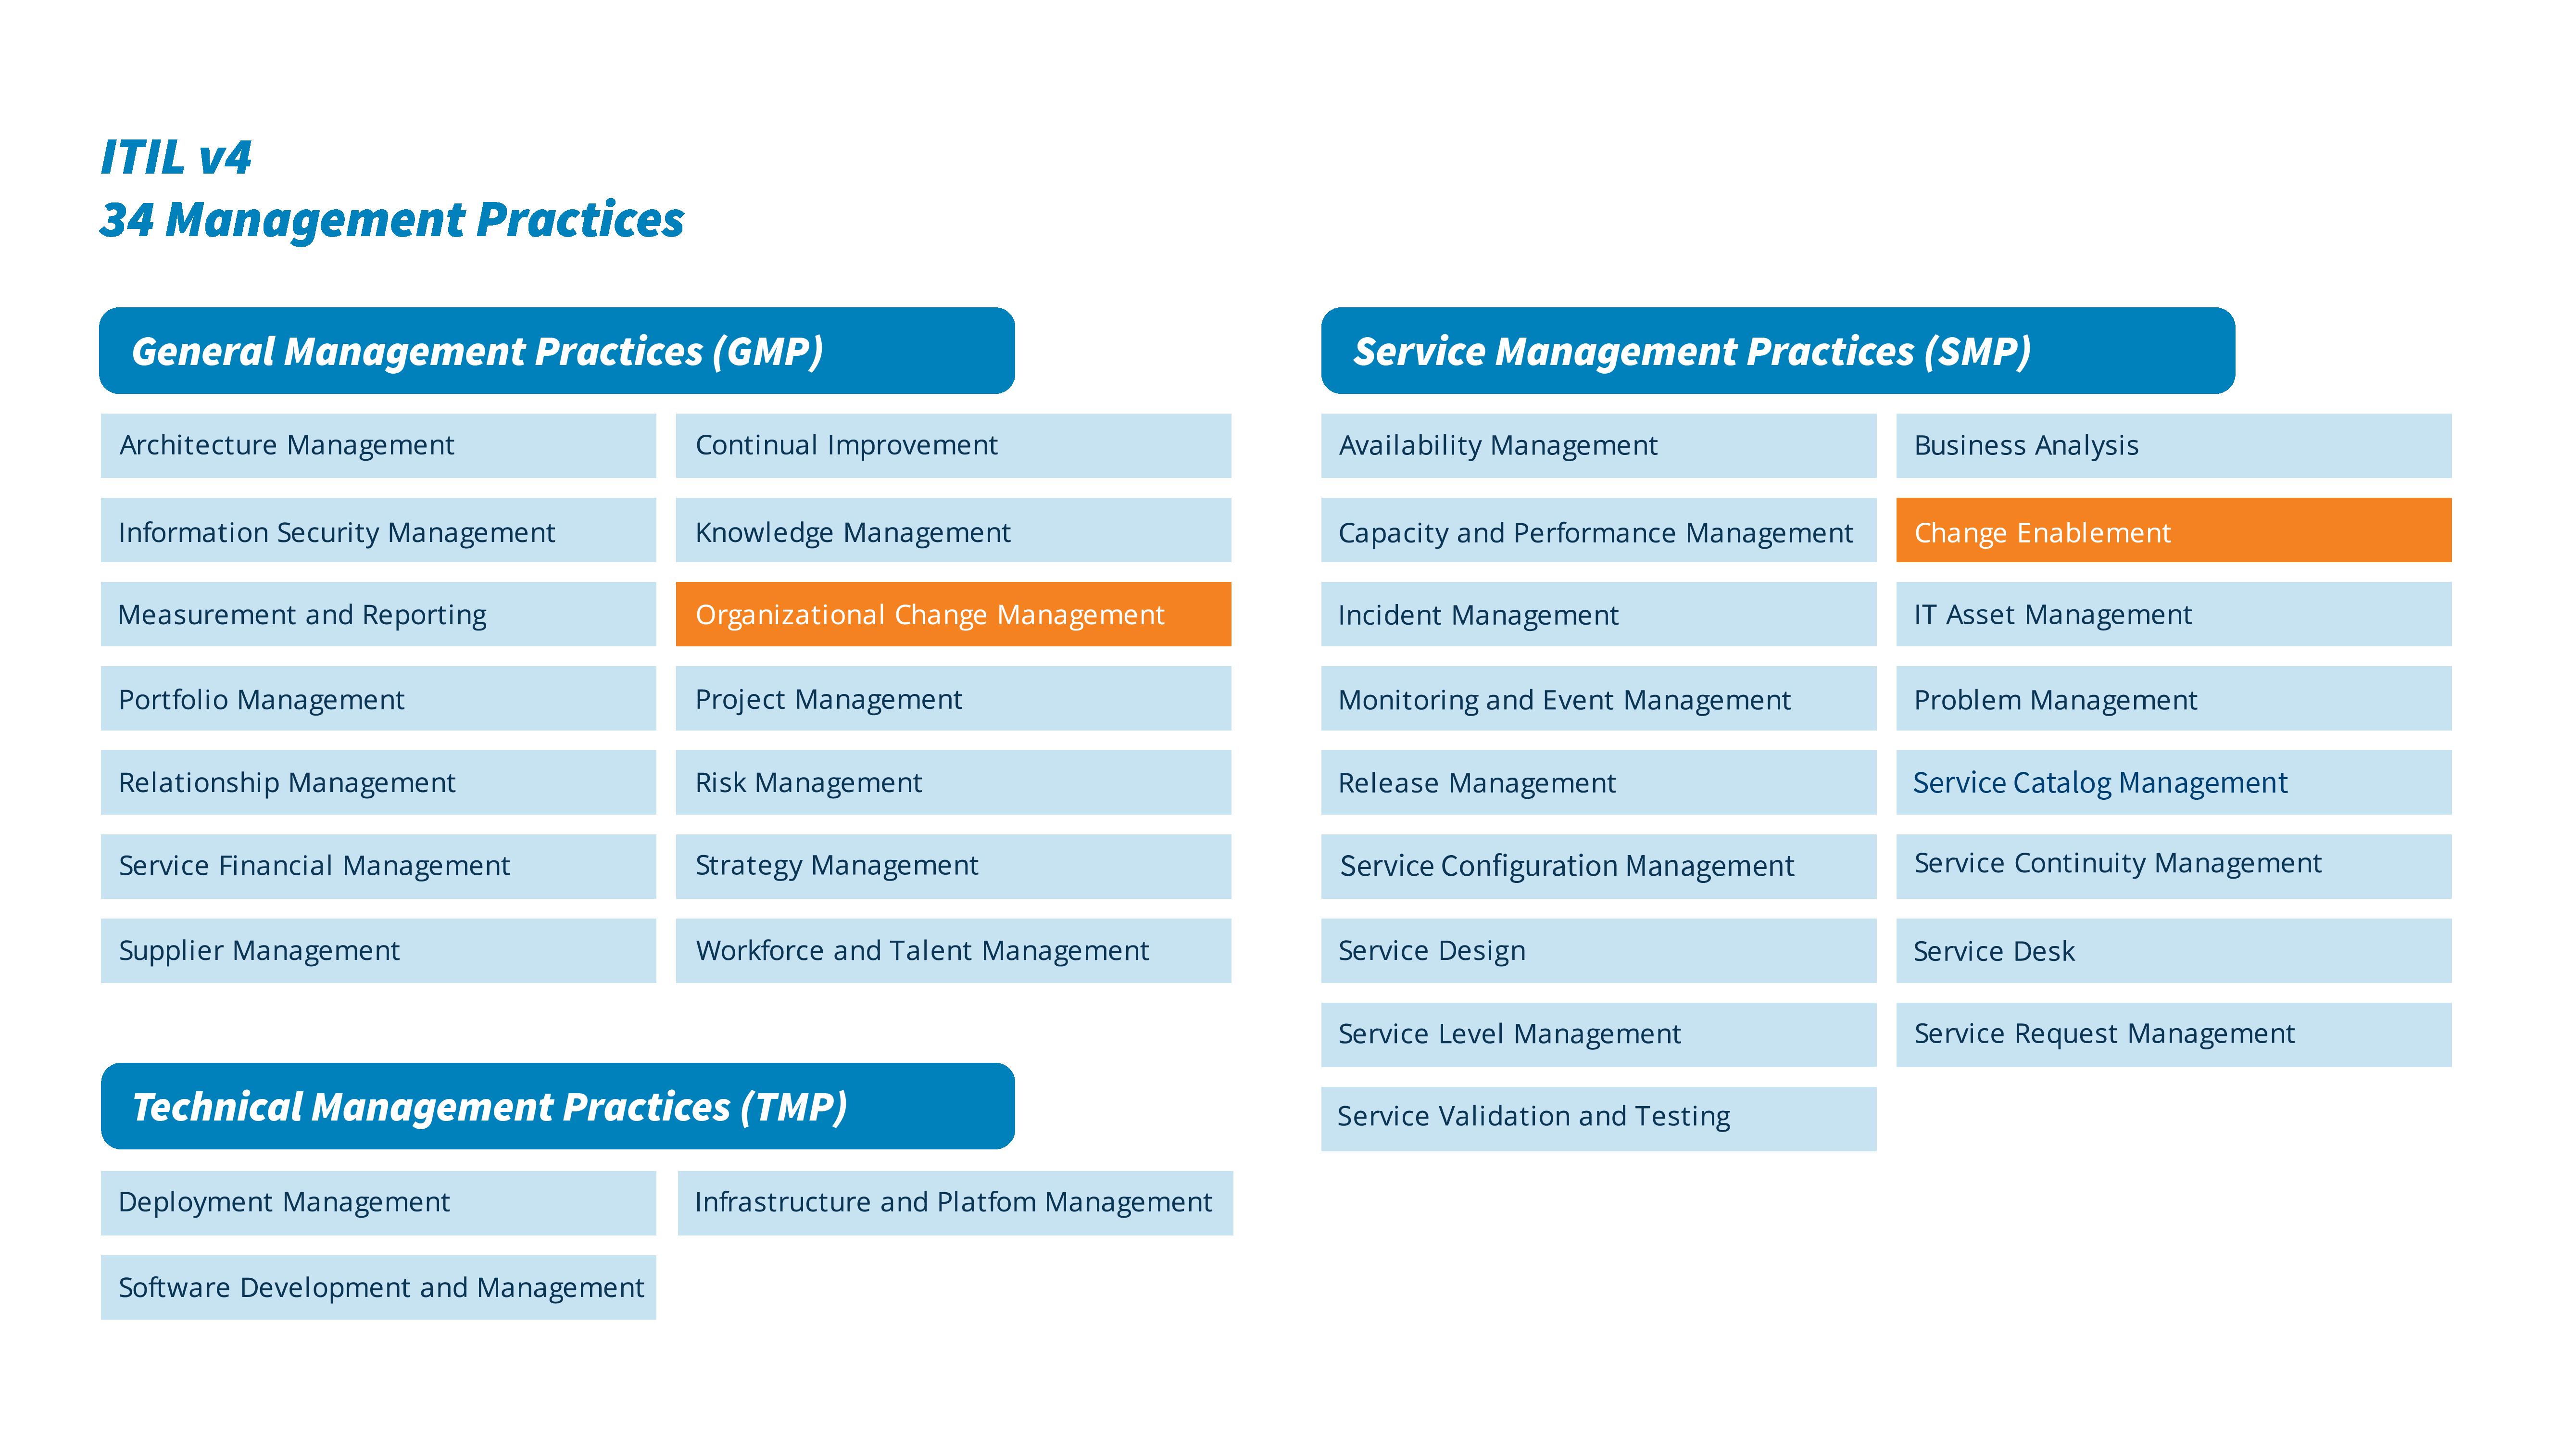 34 Management Praktiken nach ITIL 4.